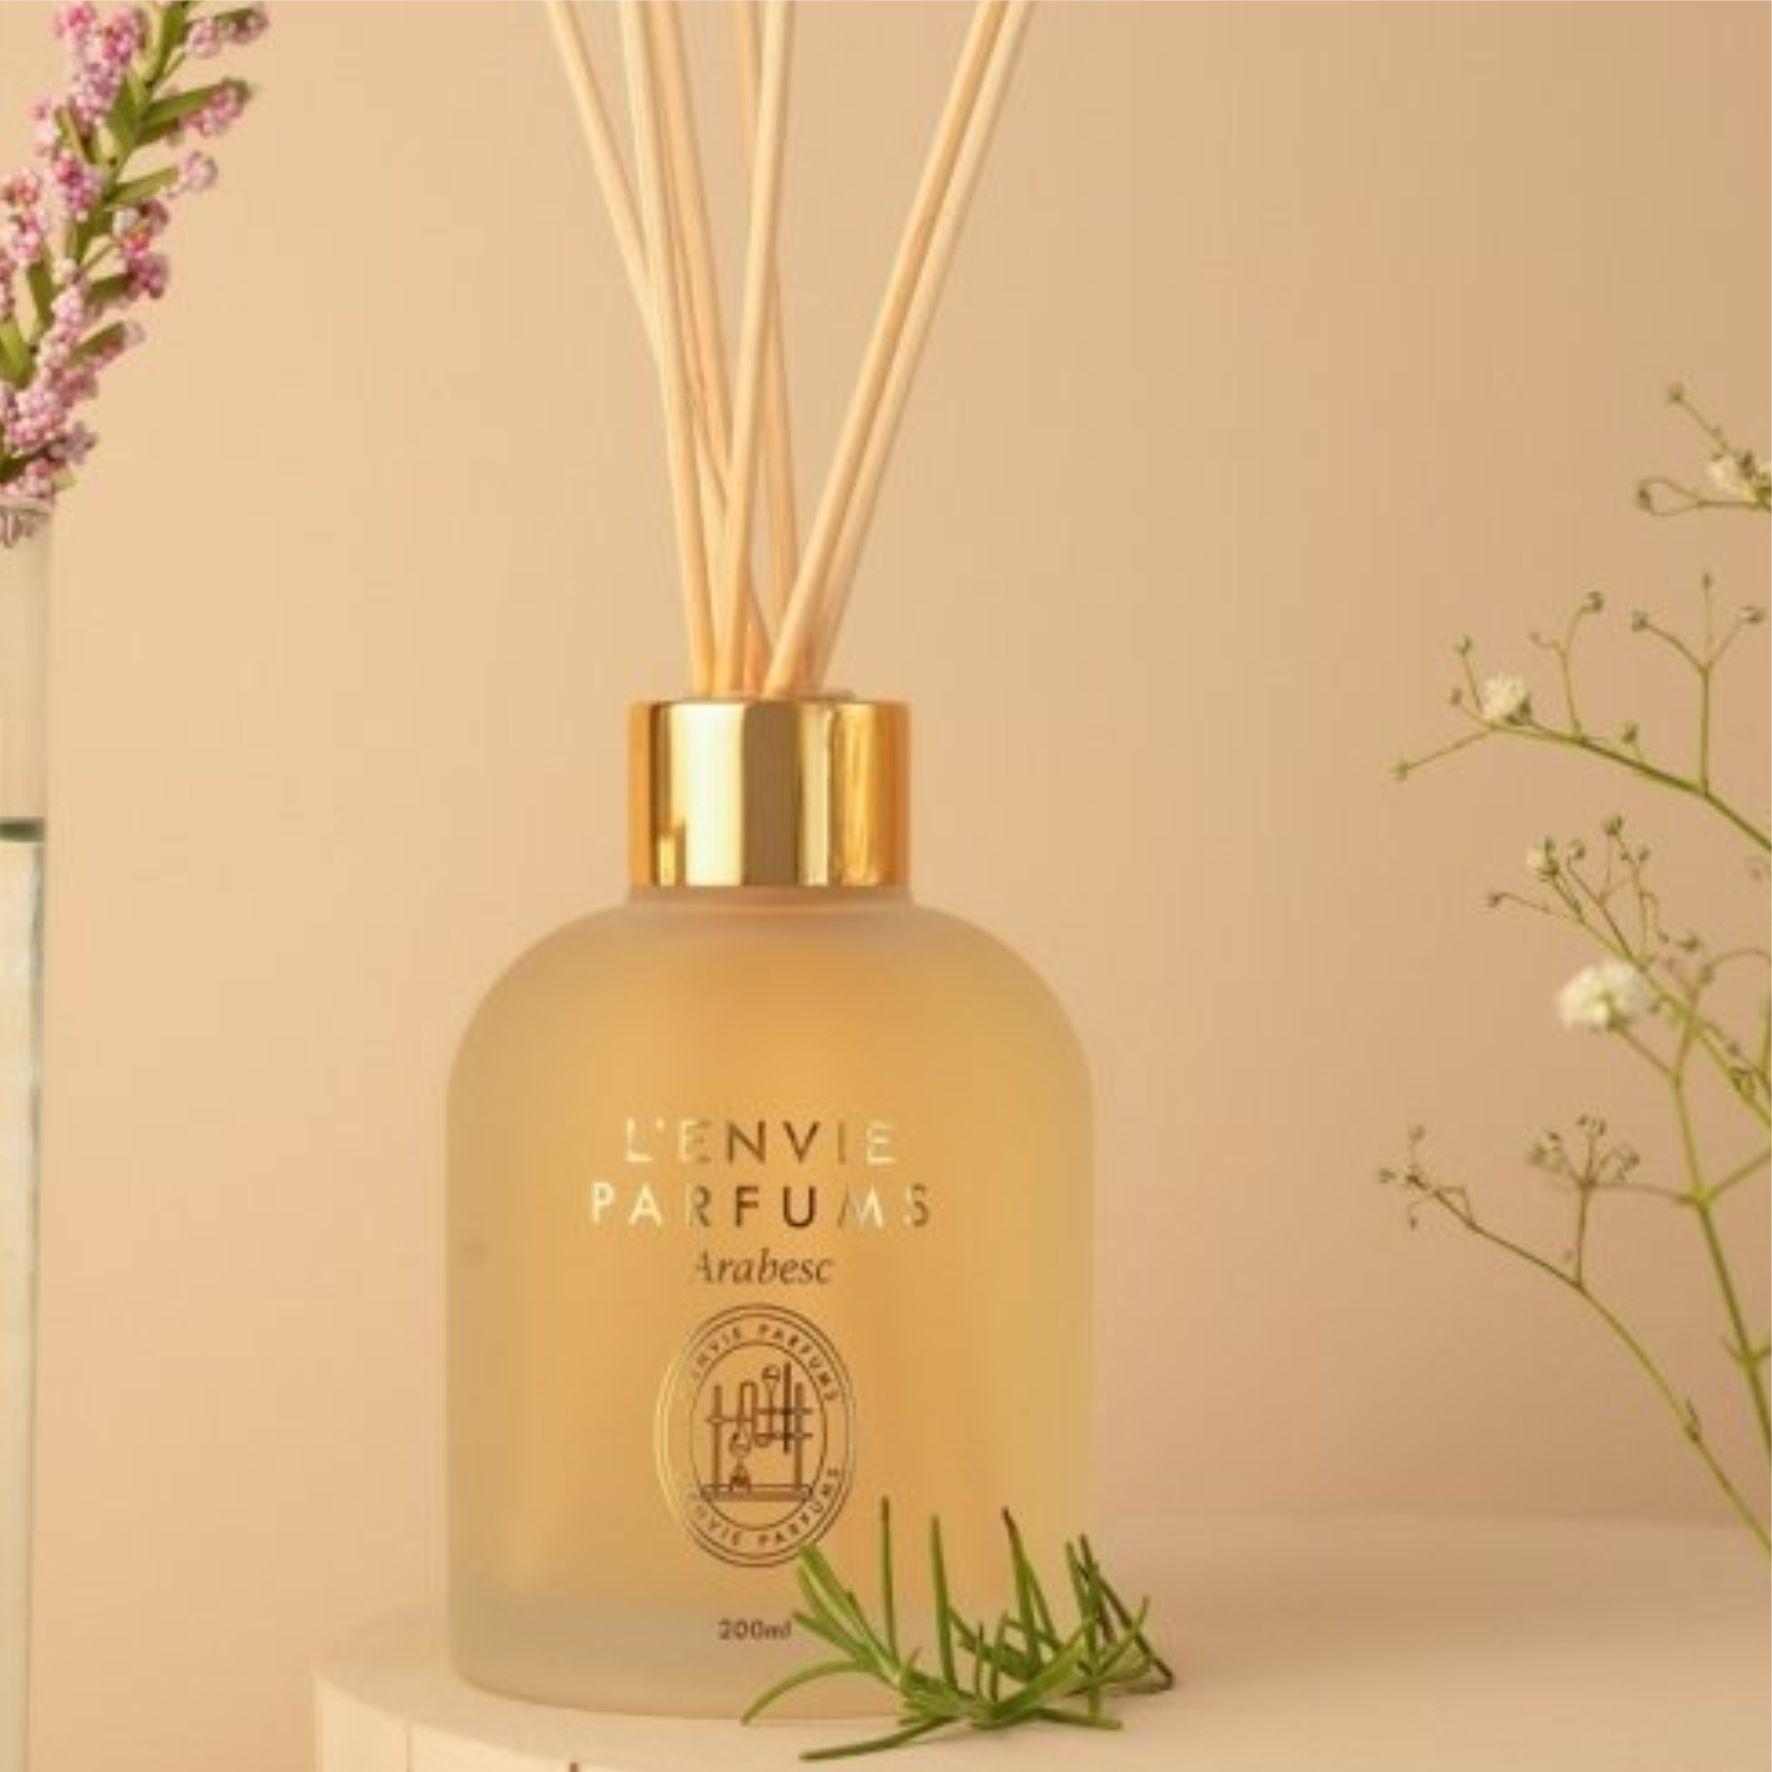 Difusor de Ambiente Exala Perfume L'Envie 200ml Magnólia Pacífica